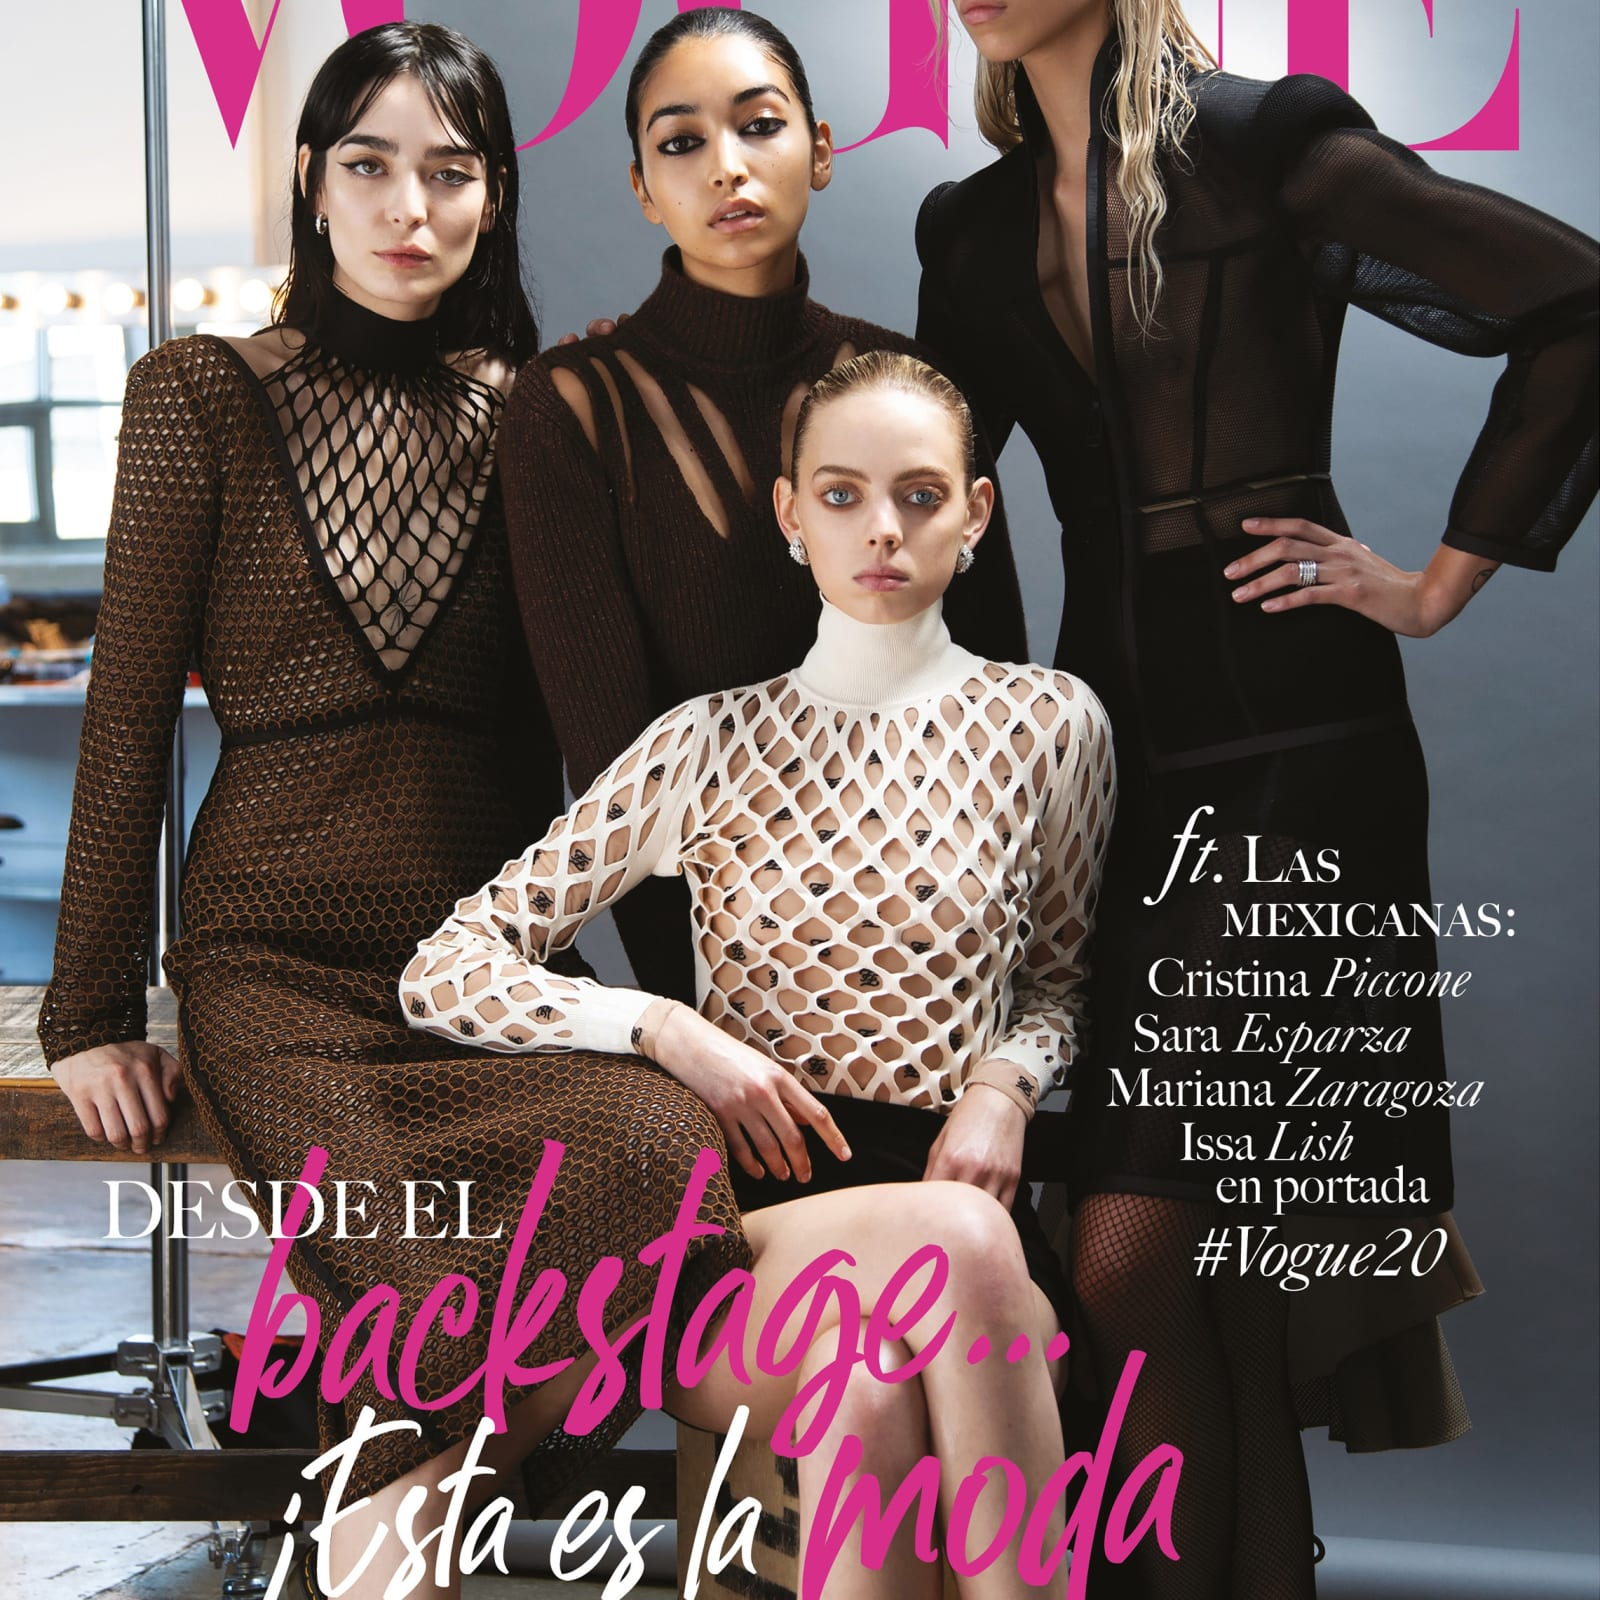 The Top 20: Vogue México